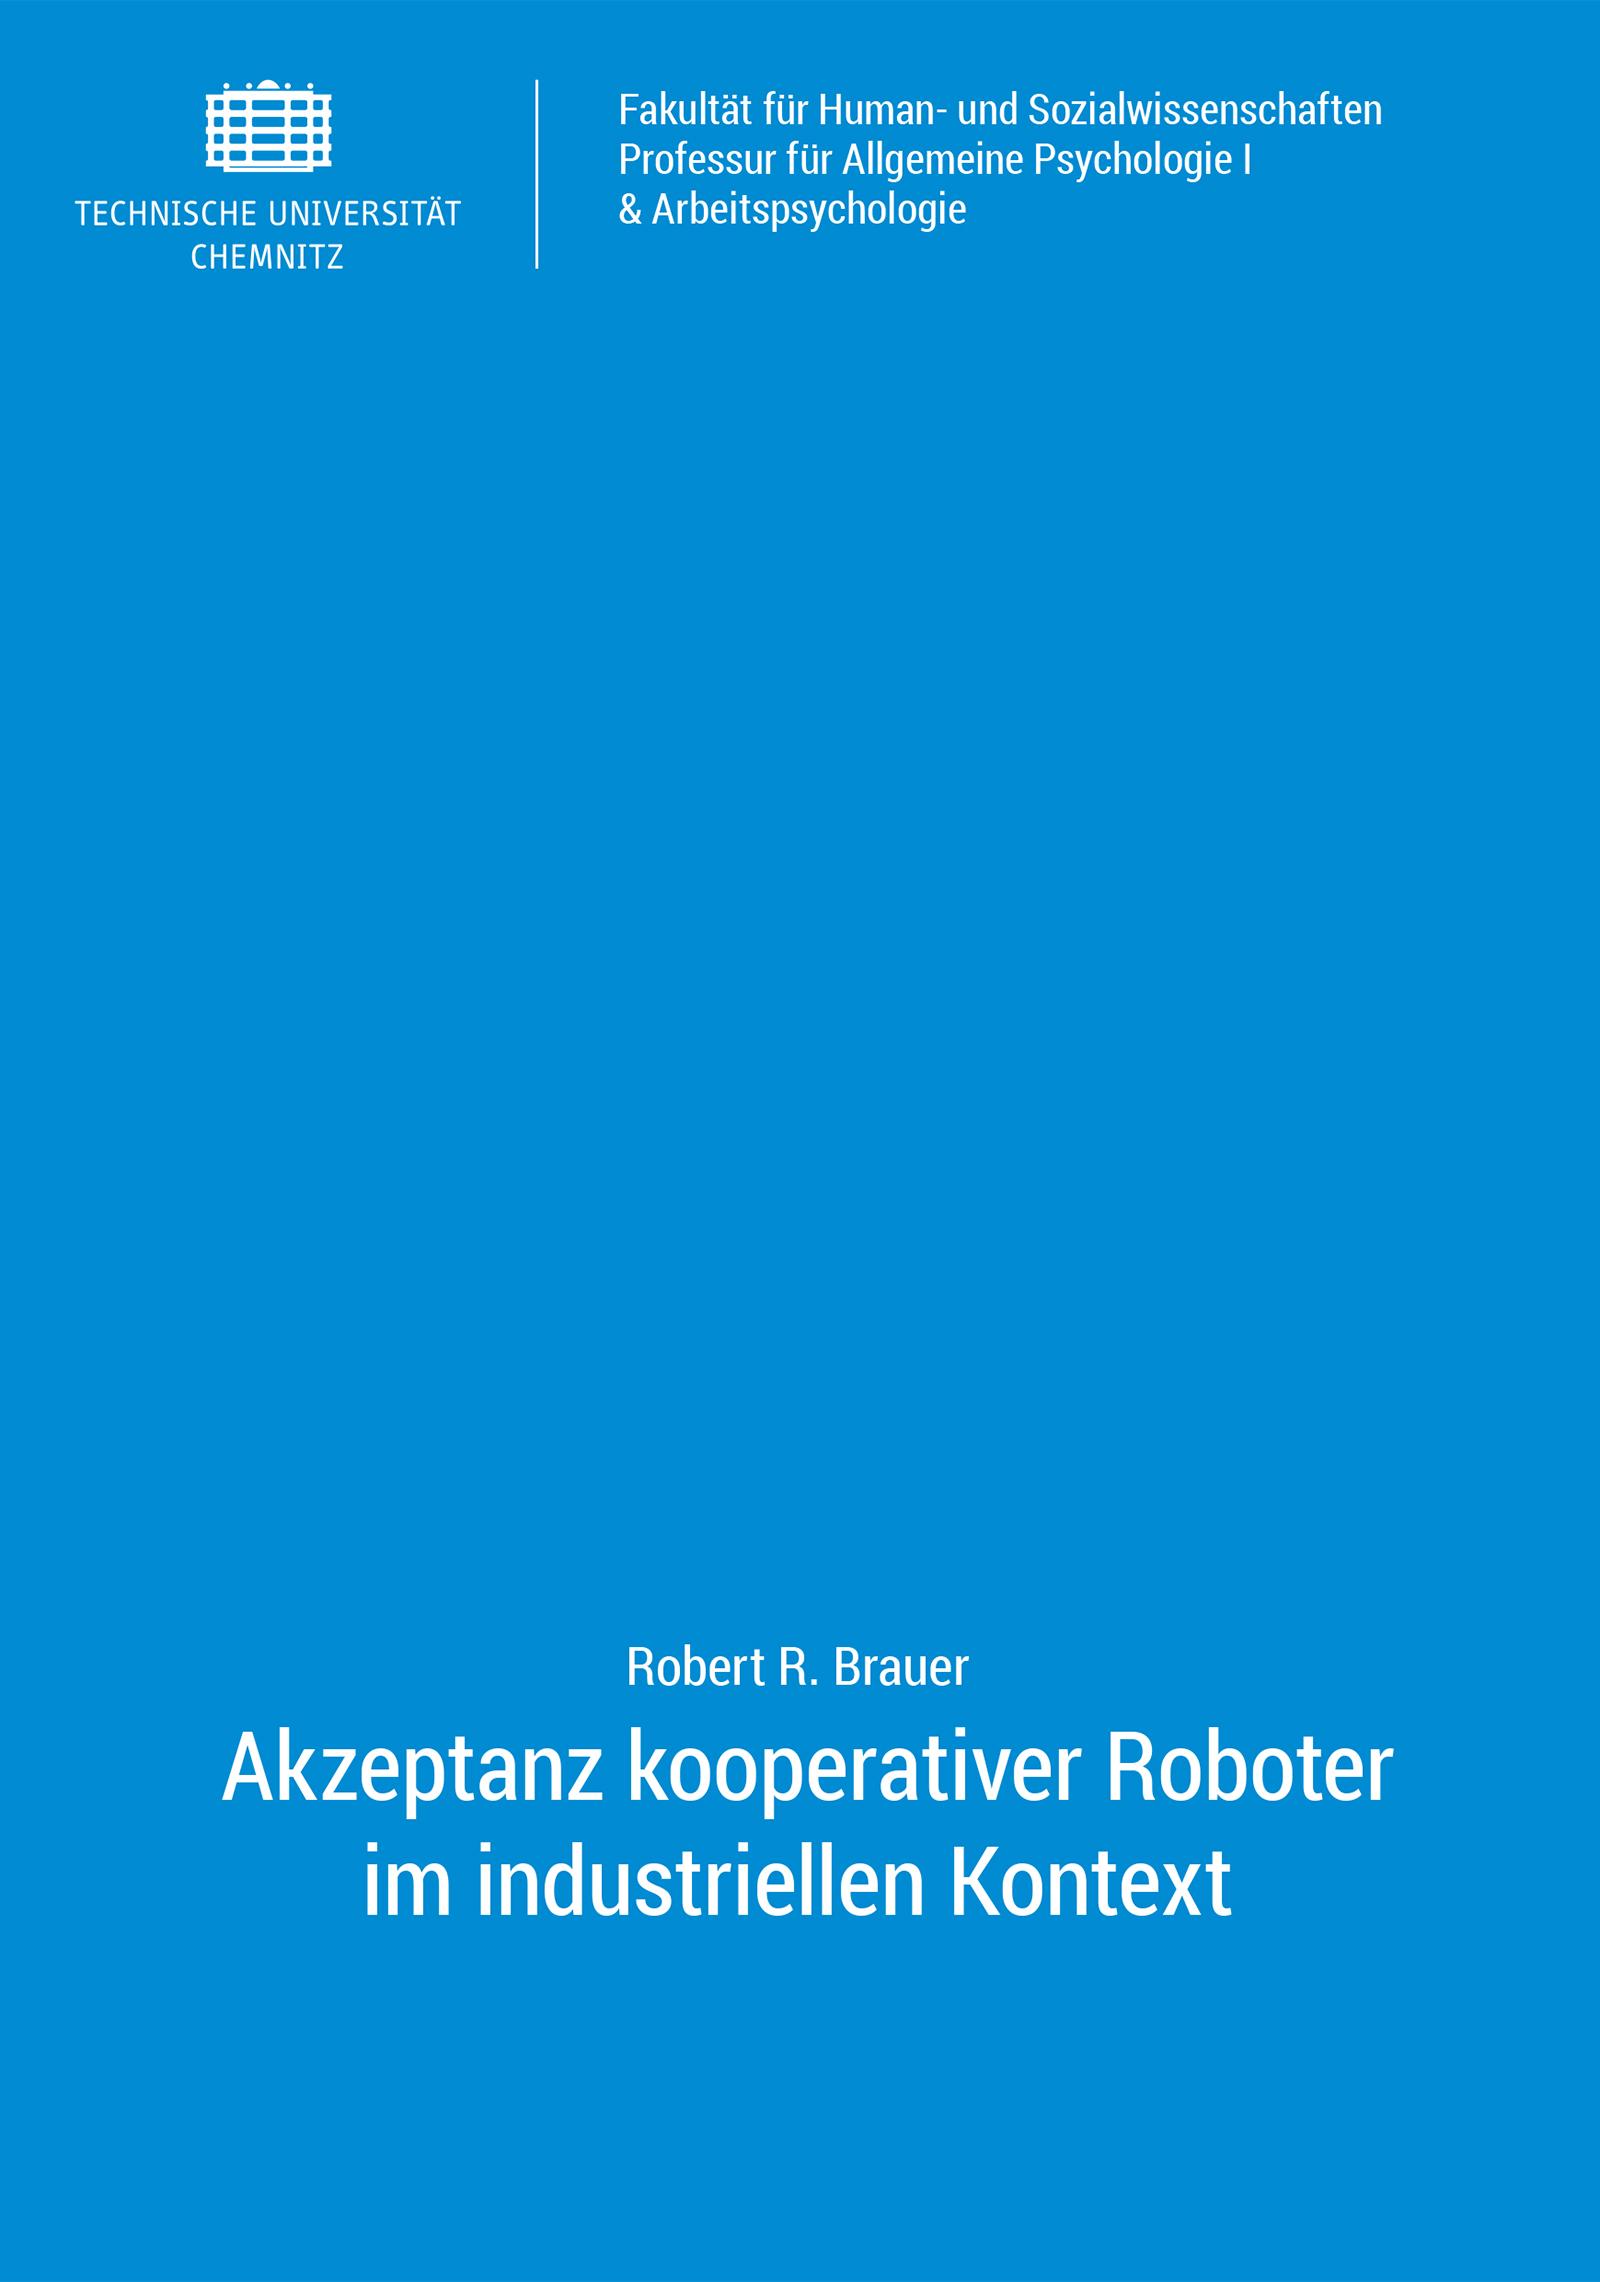 Cover: Akzeptanz kooperativer Roboter im industriellen Kontext